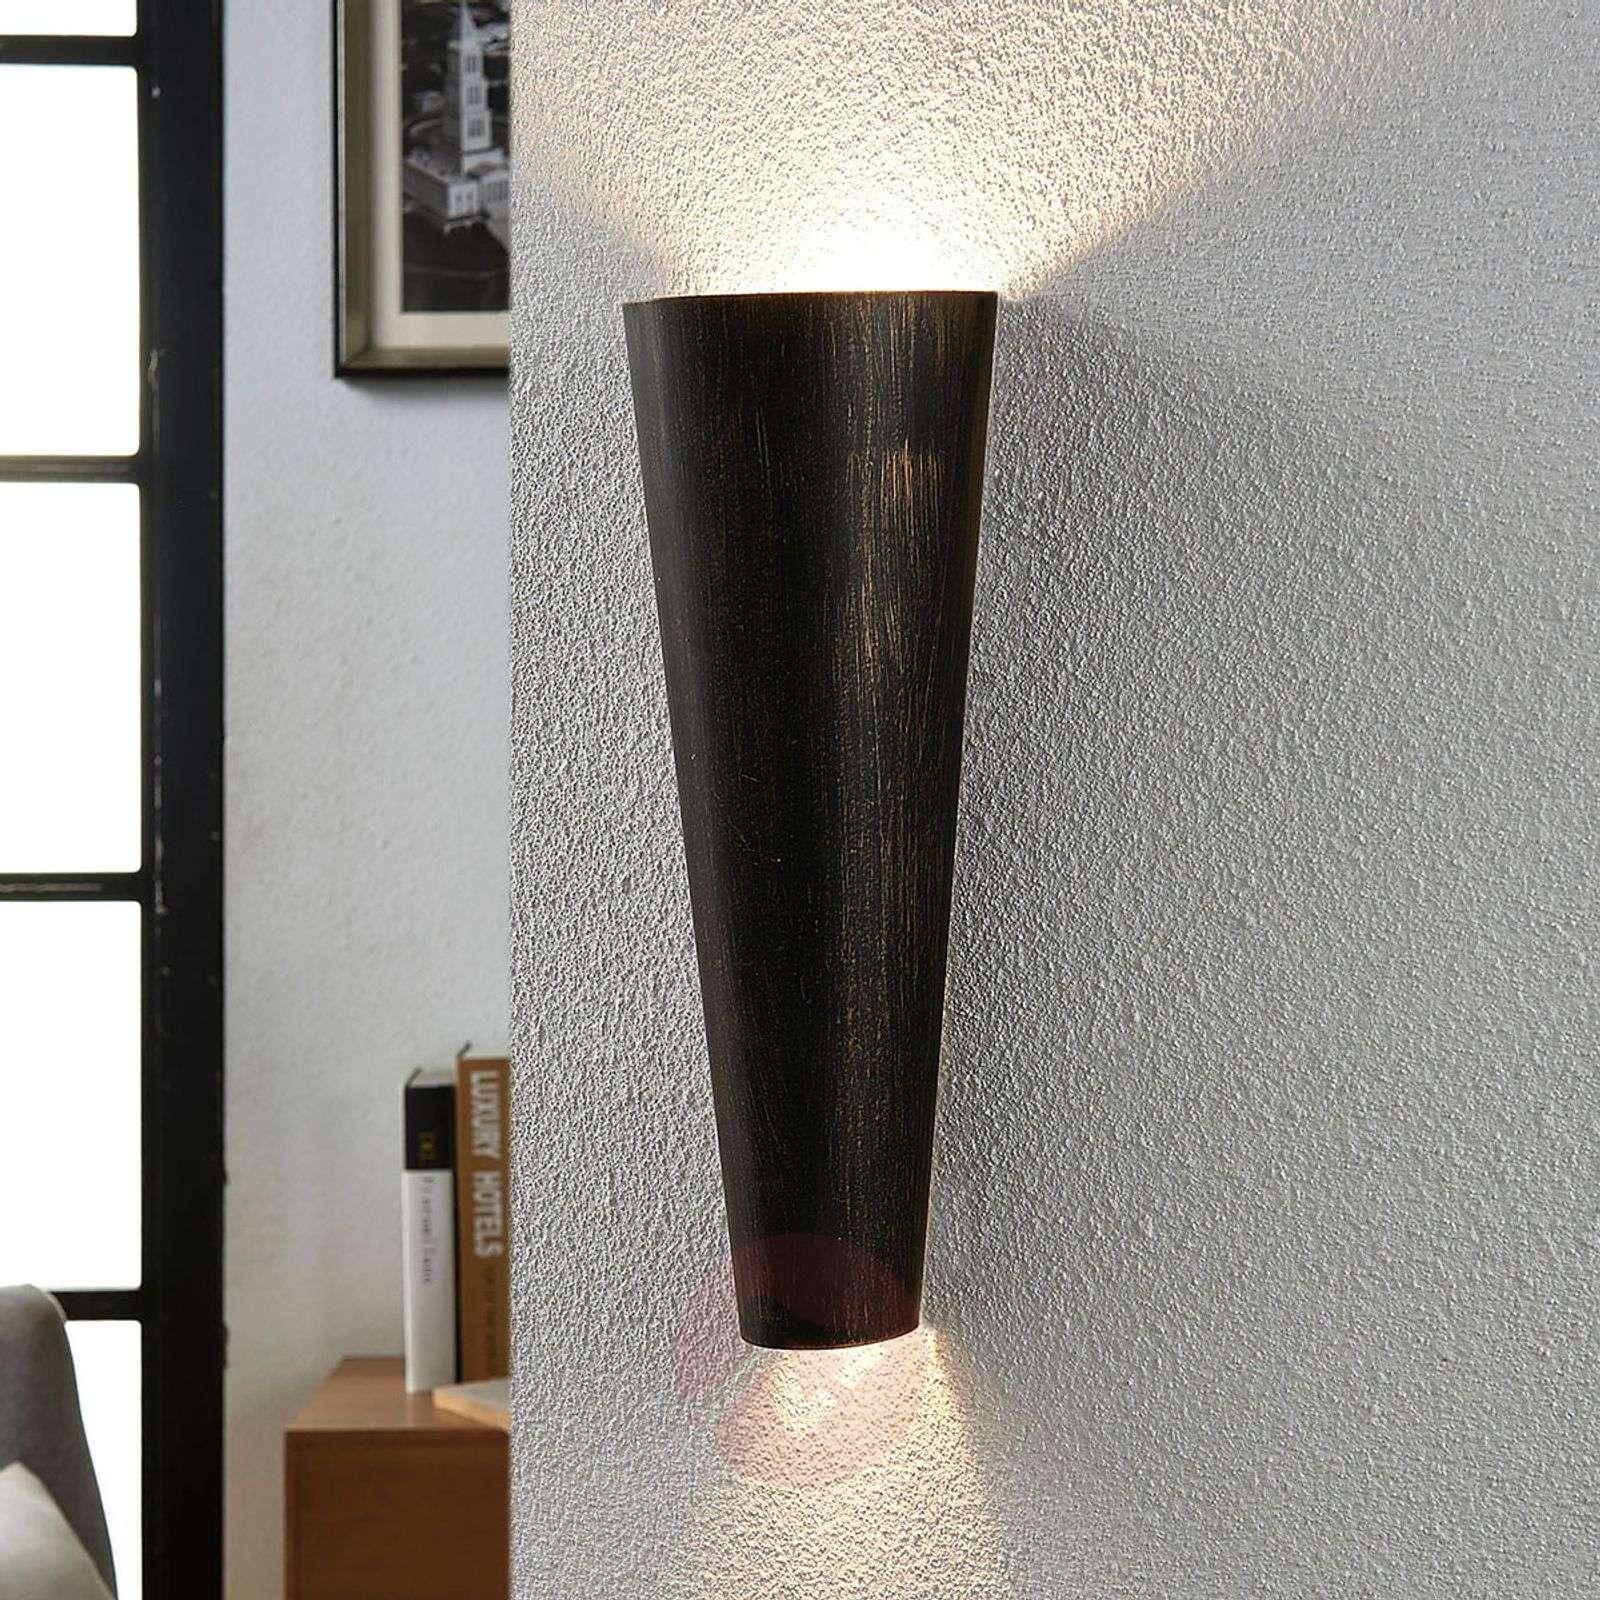 Black gold wall light Conan, indirect light-9620935-03